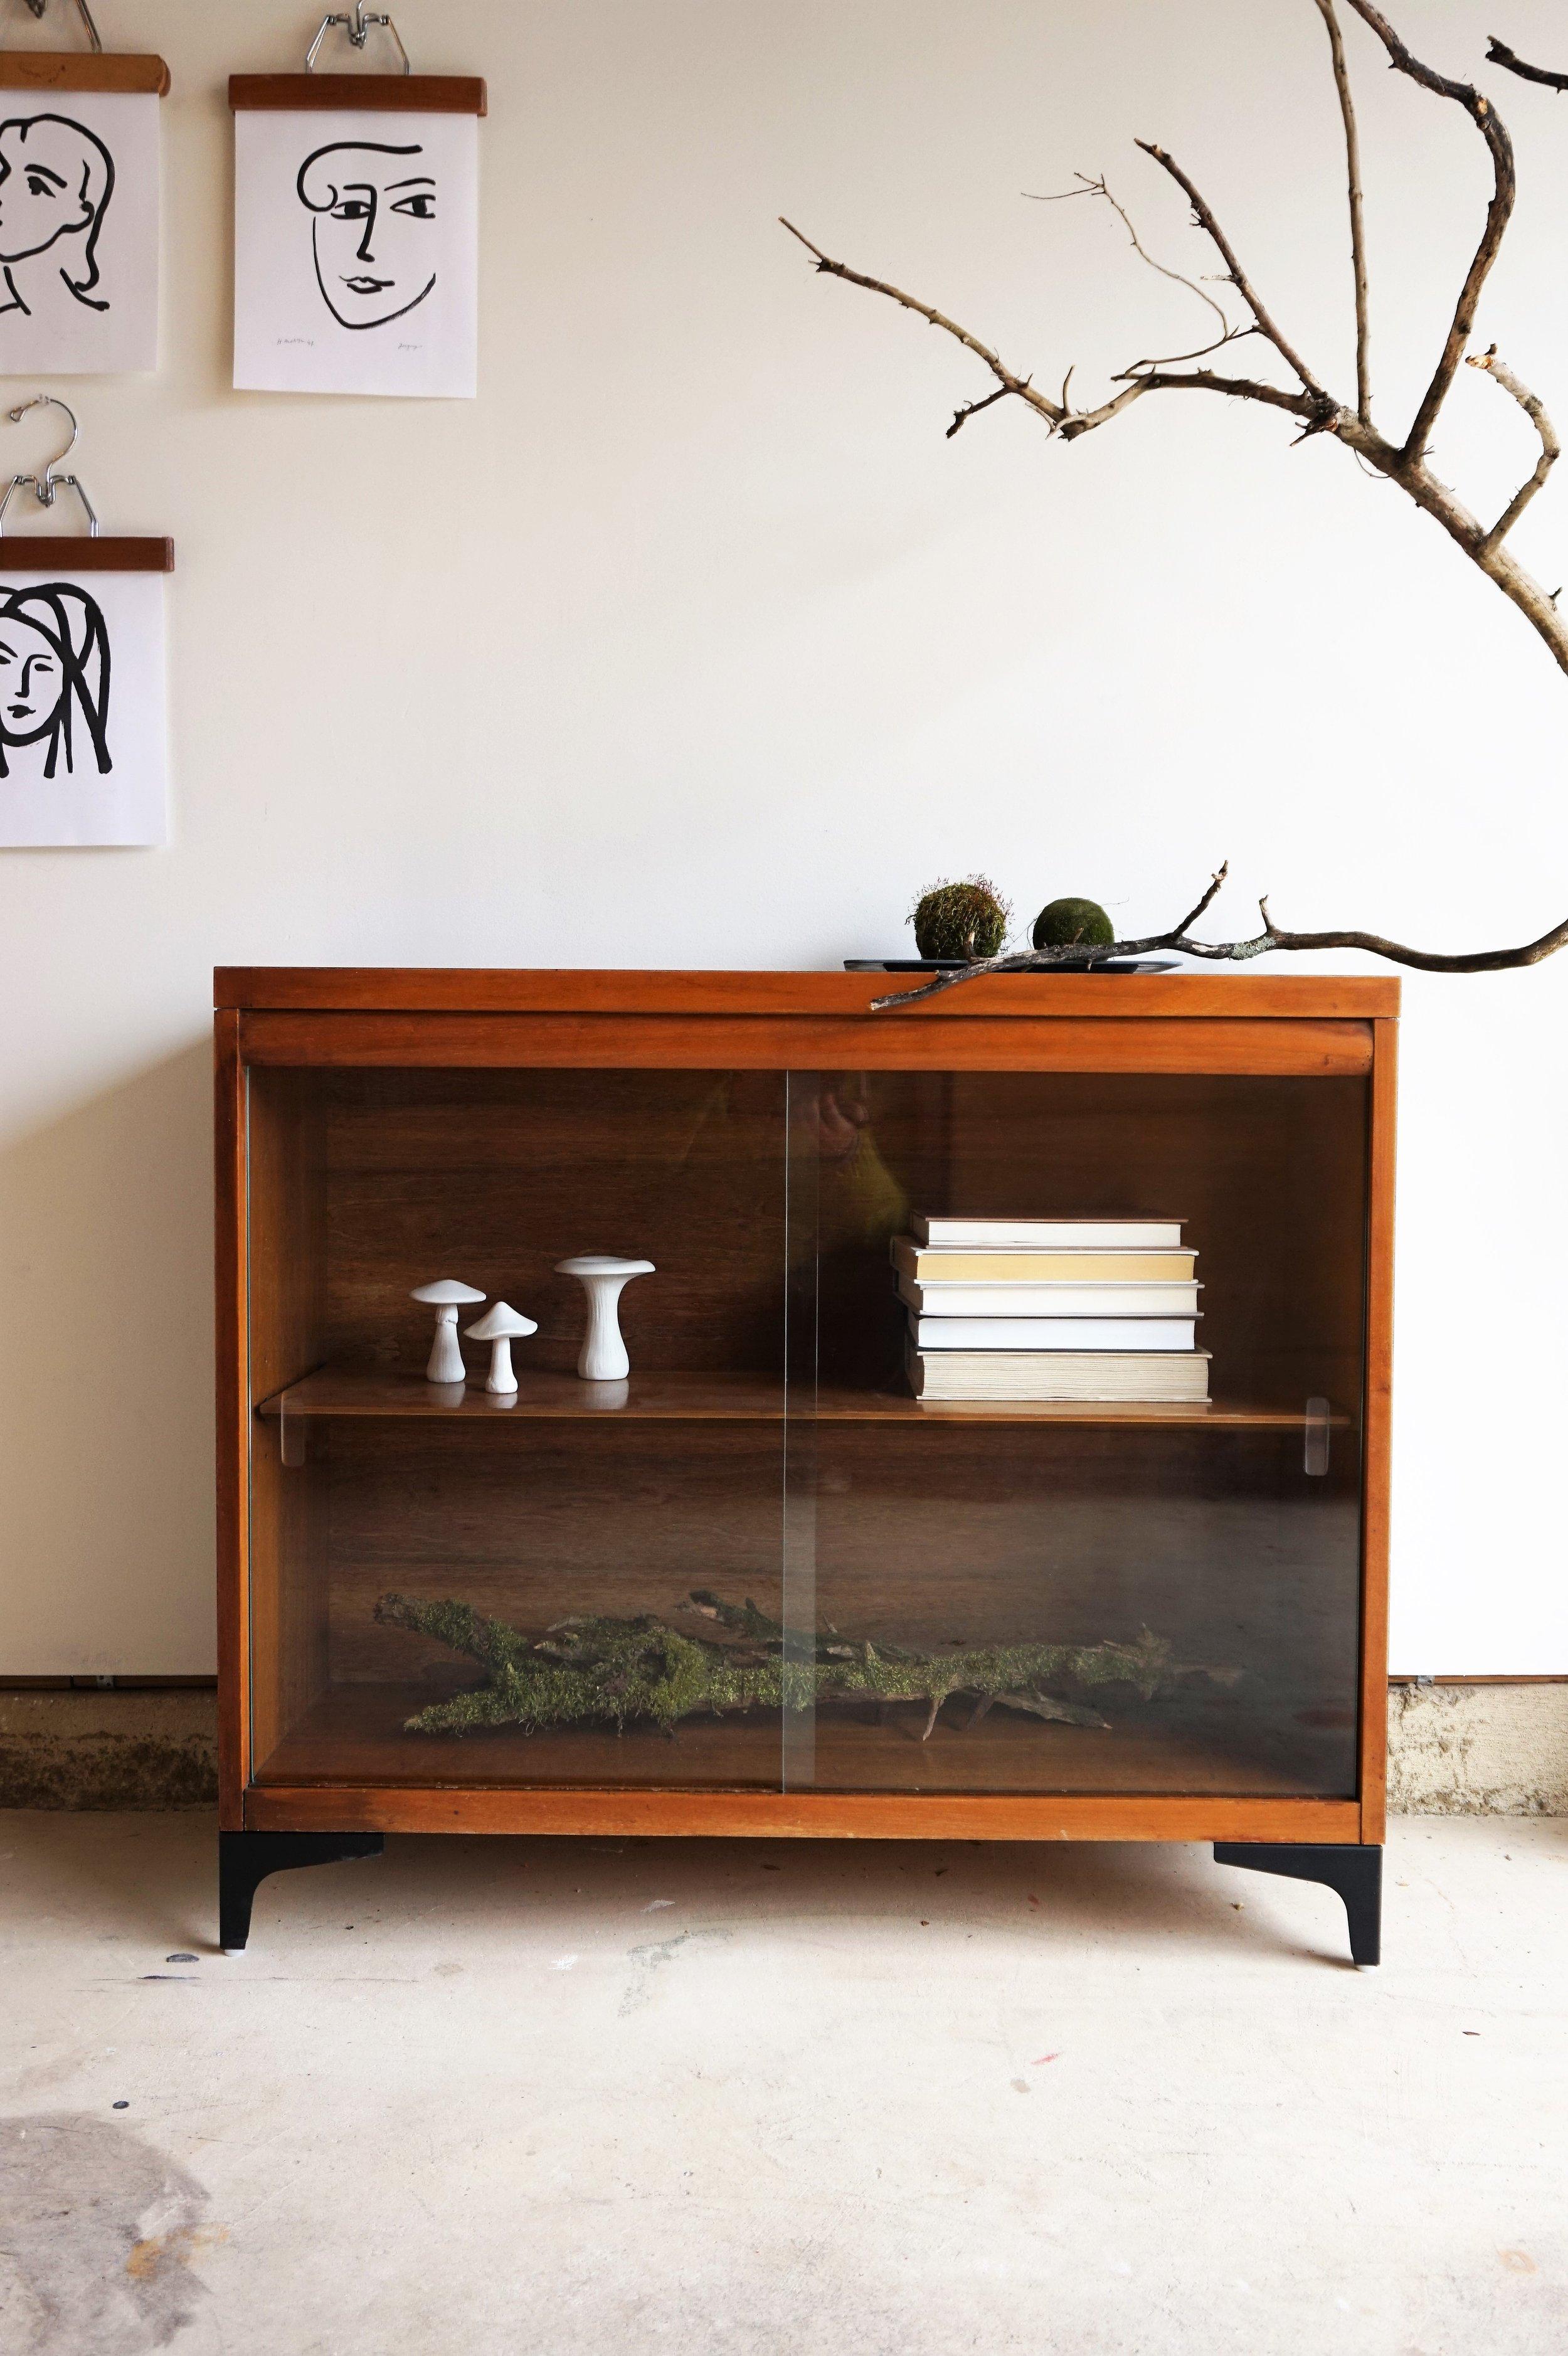 Bookshelf Blog Stylemutt Home Your Home Decor Resource